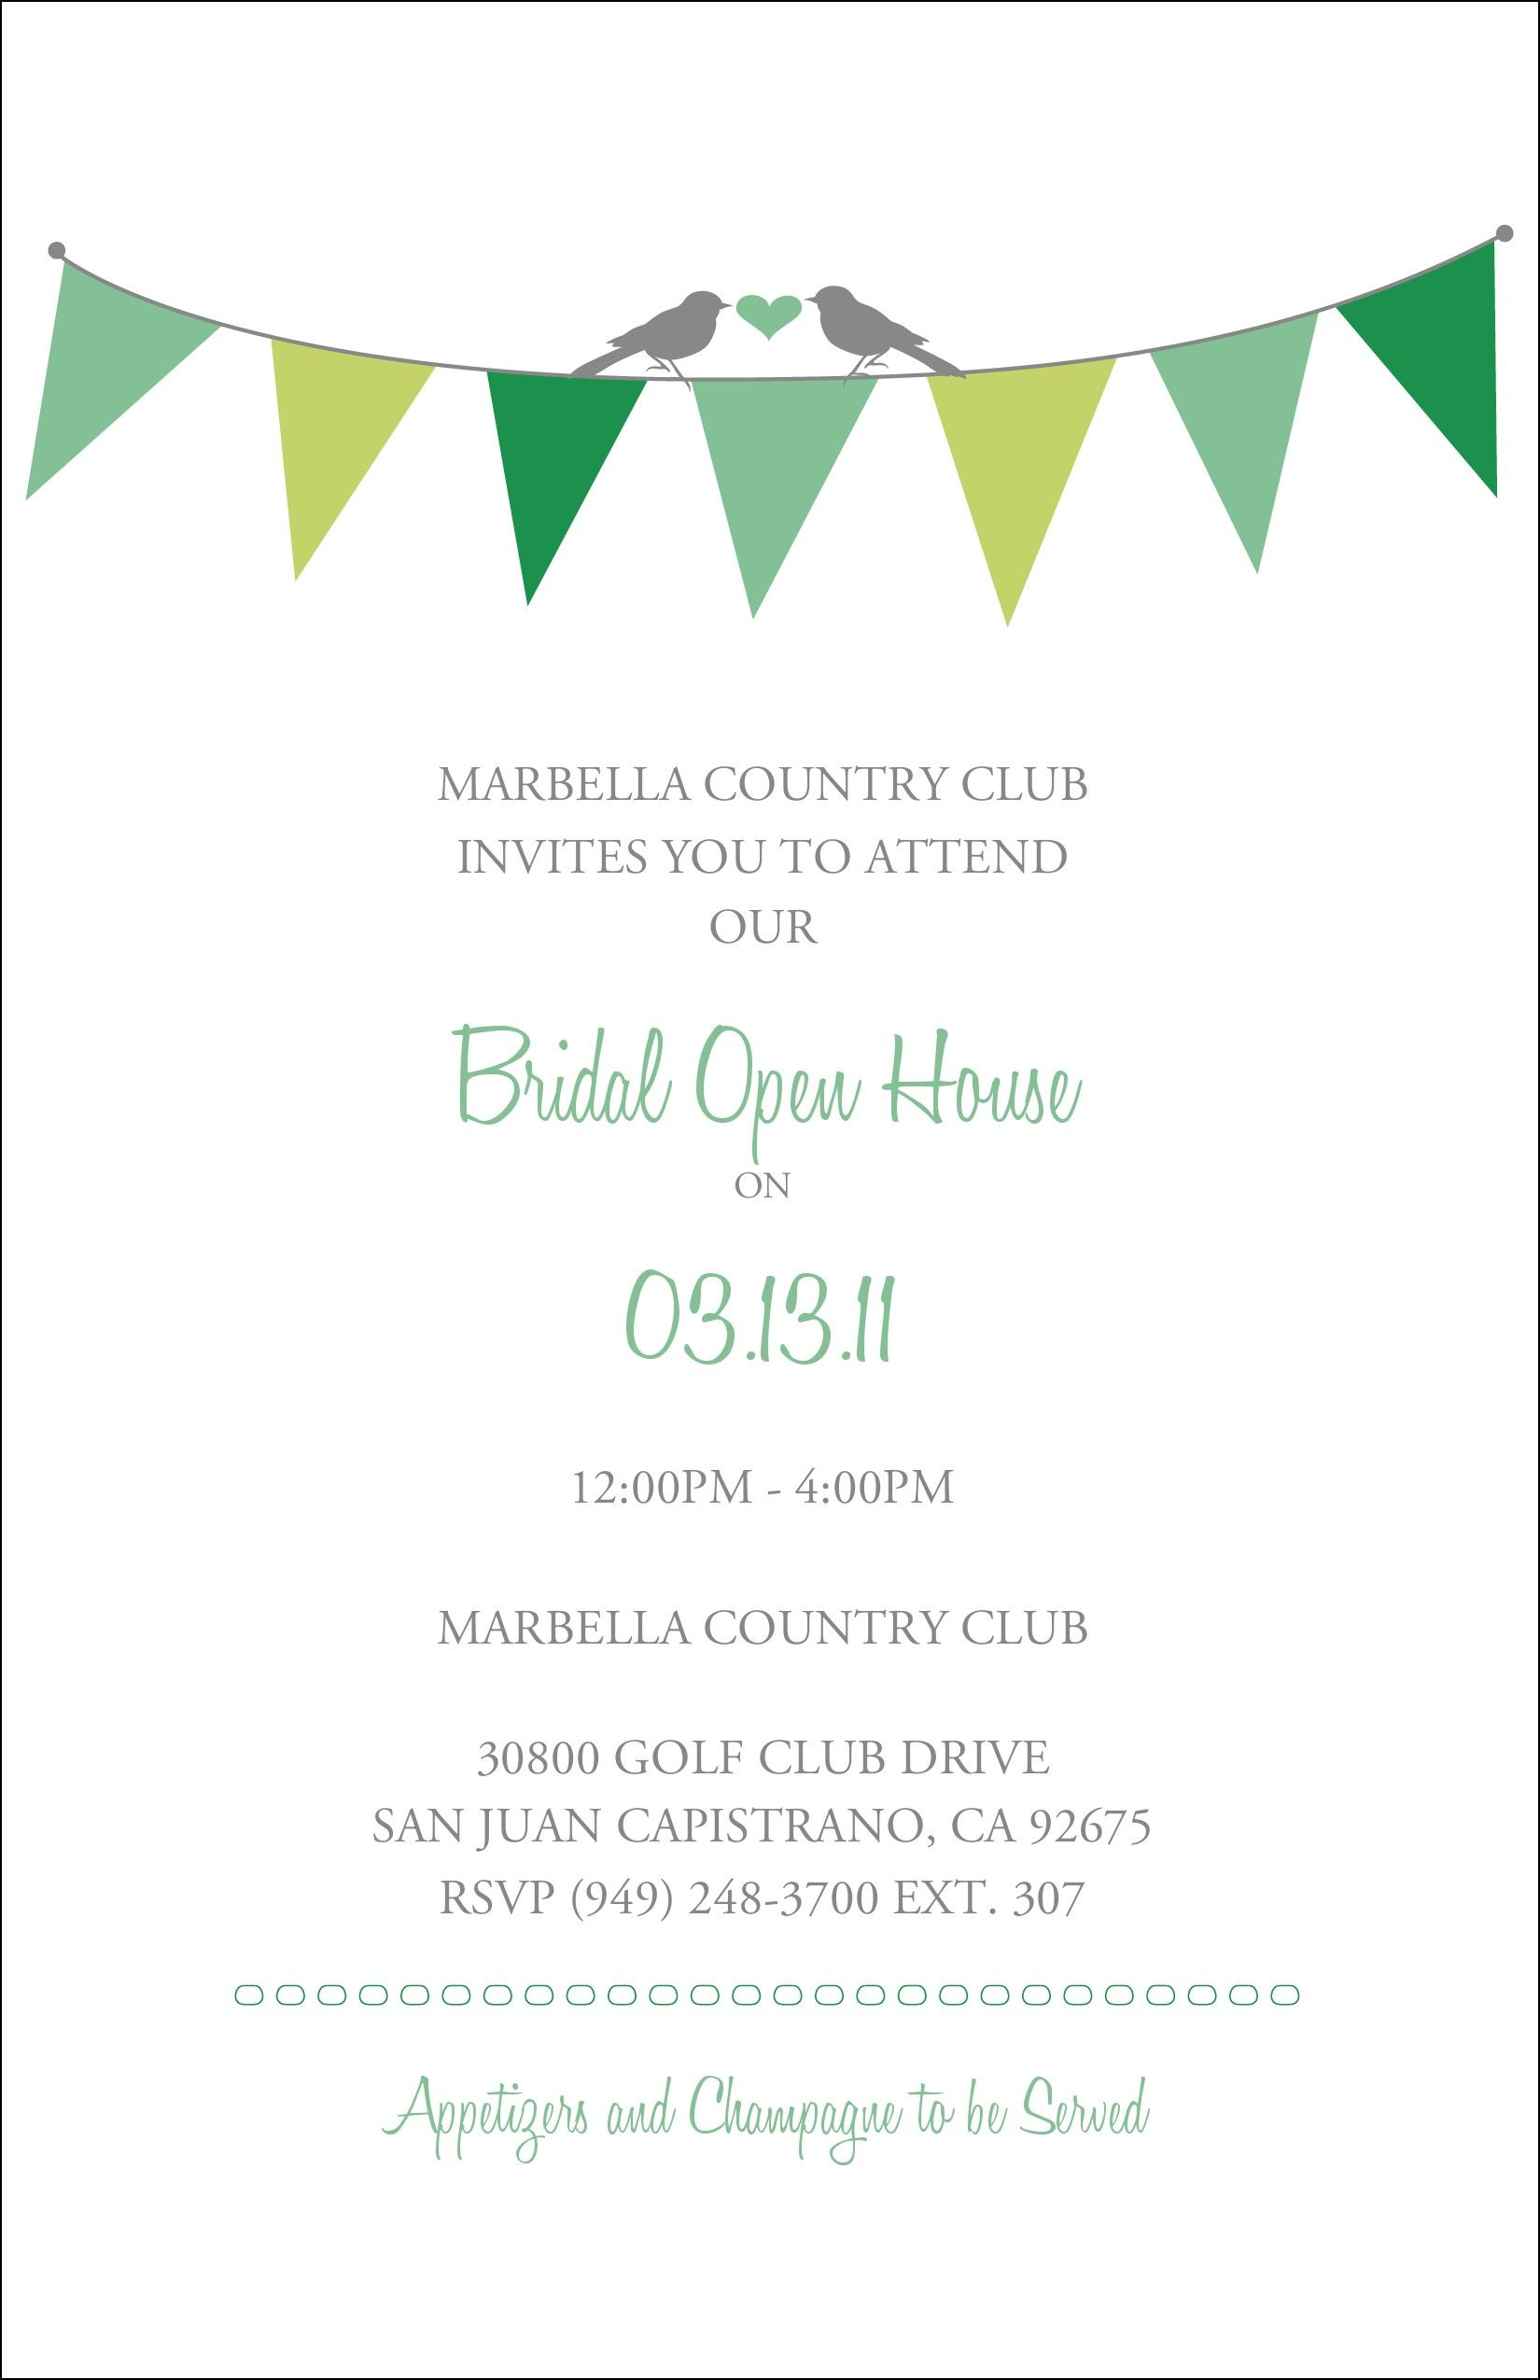 Wedding Open House Invitation Wording